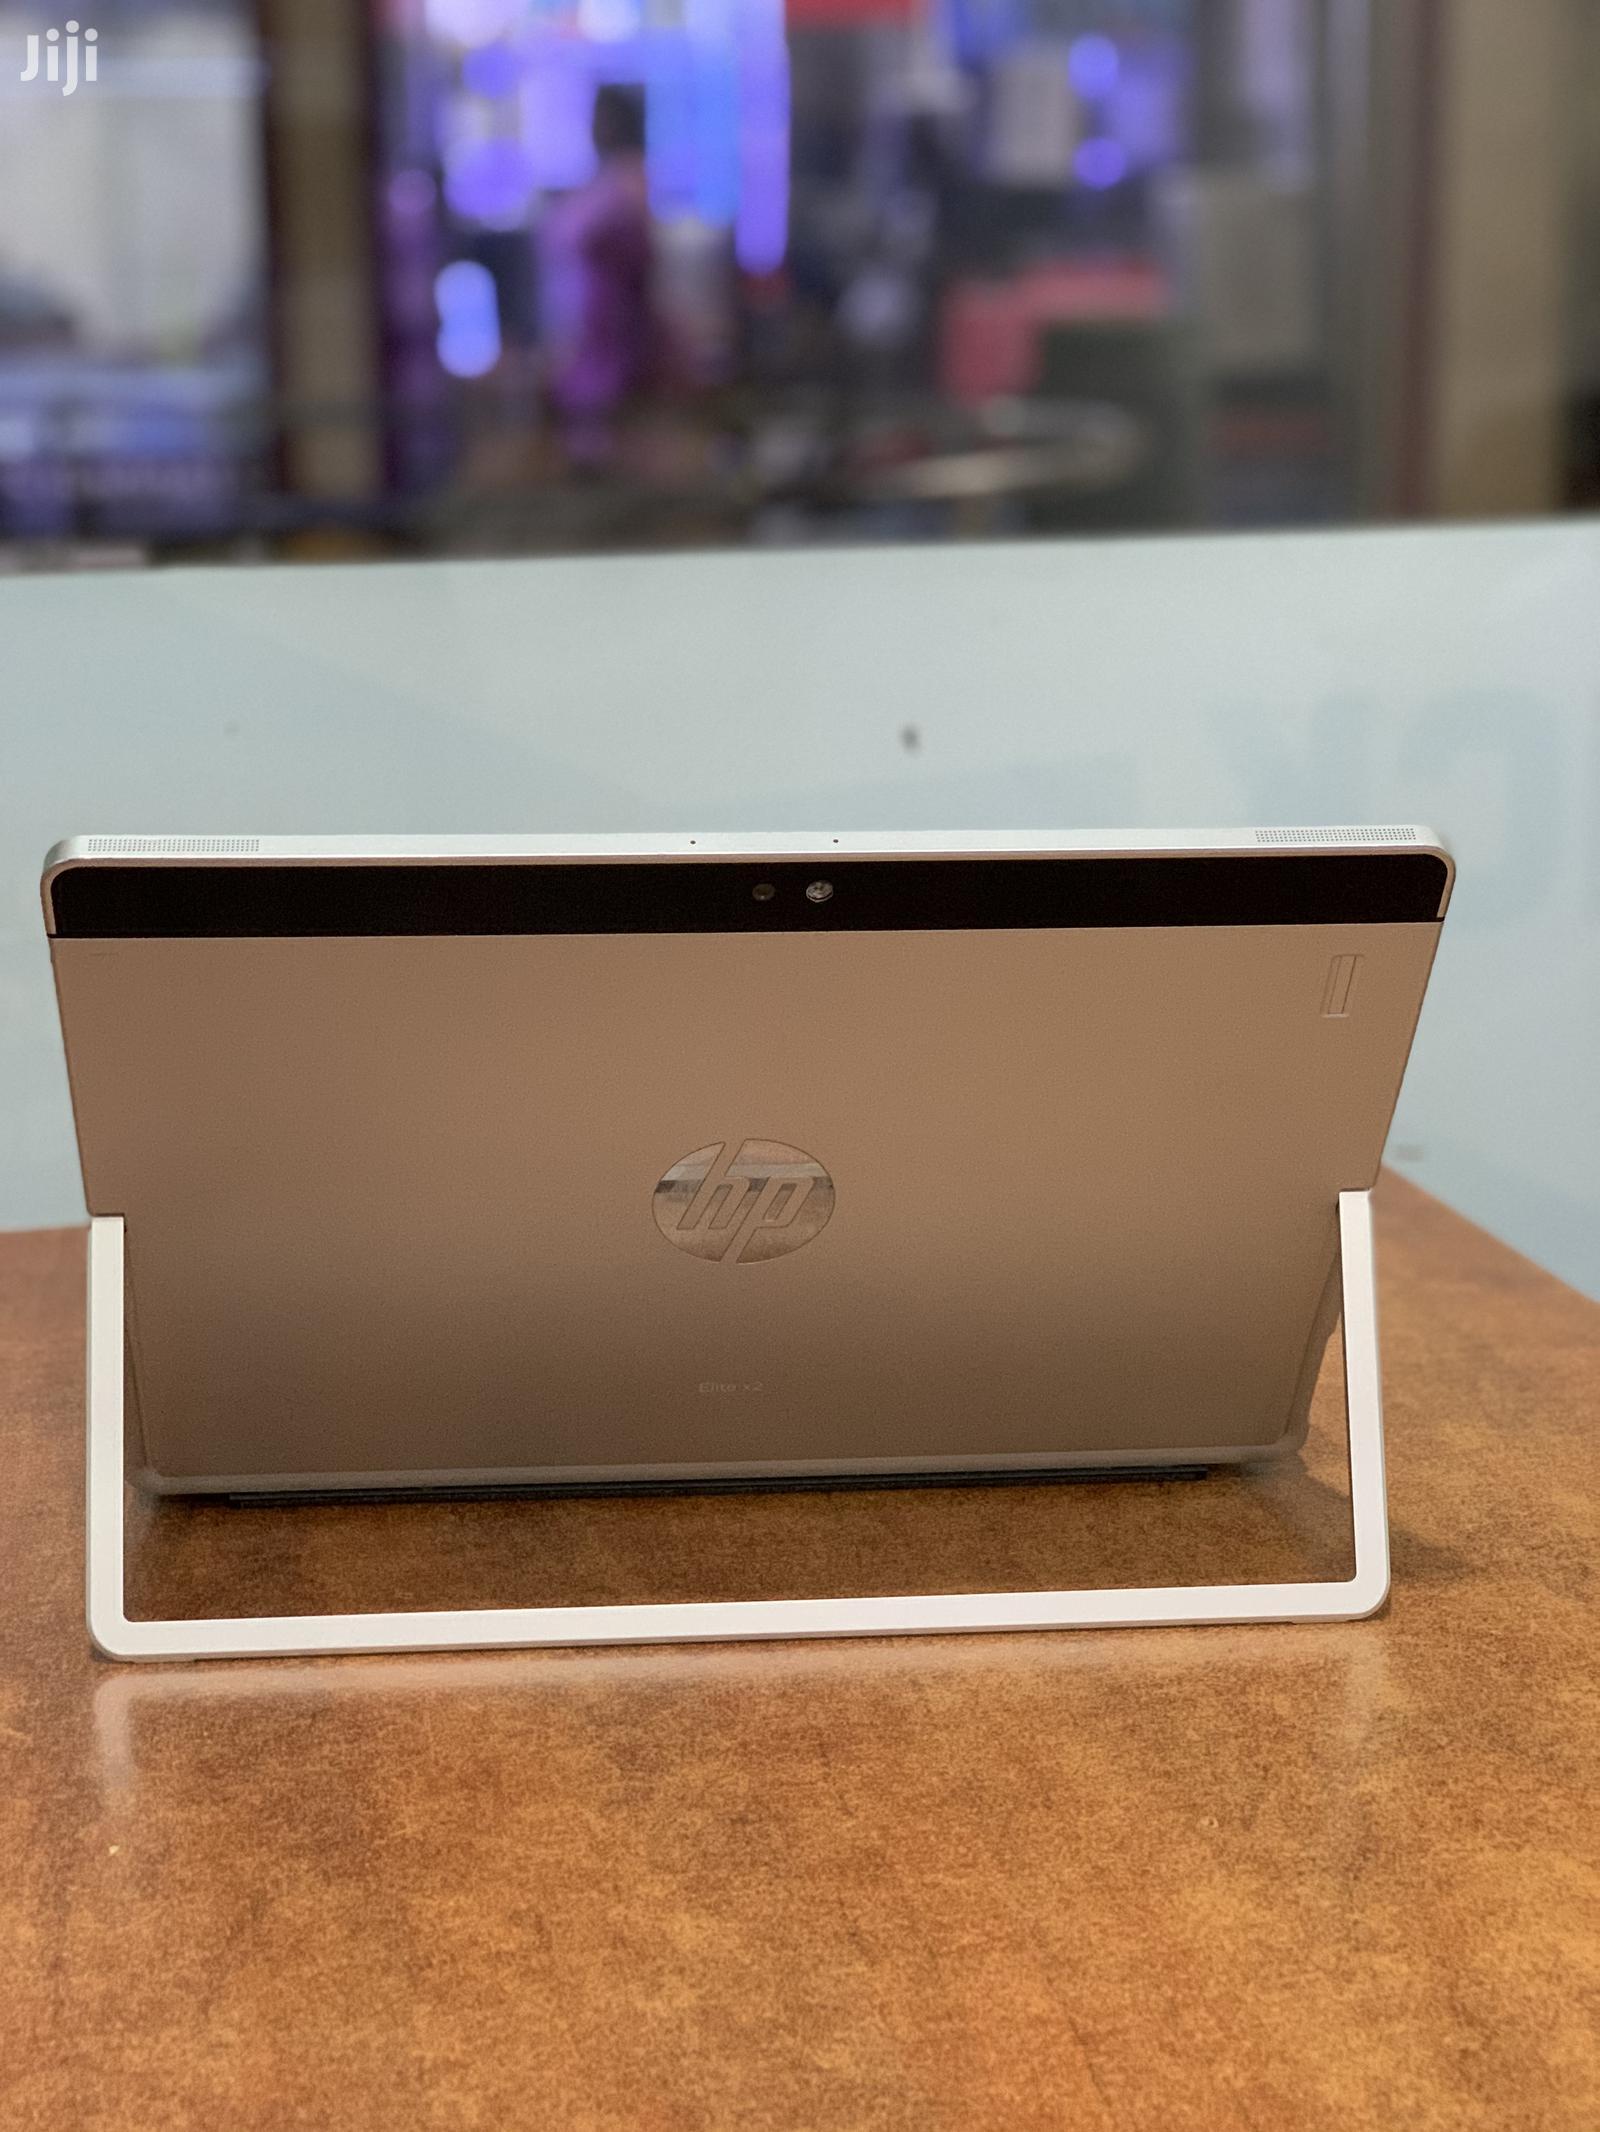 New Laptop HP Elite x2 1013 G3 8GB Intel Core i5 SSHD (Hybrid) 256GB | Laptops & Computers for sale in Kampala, Central Region, Uganda